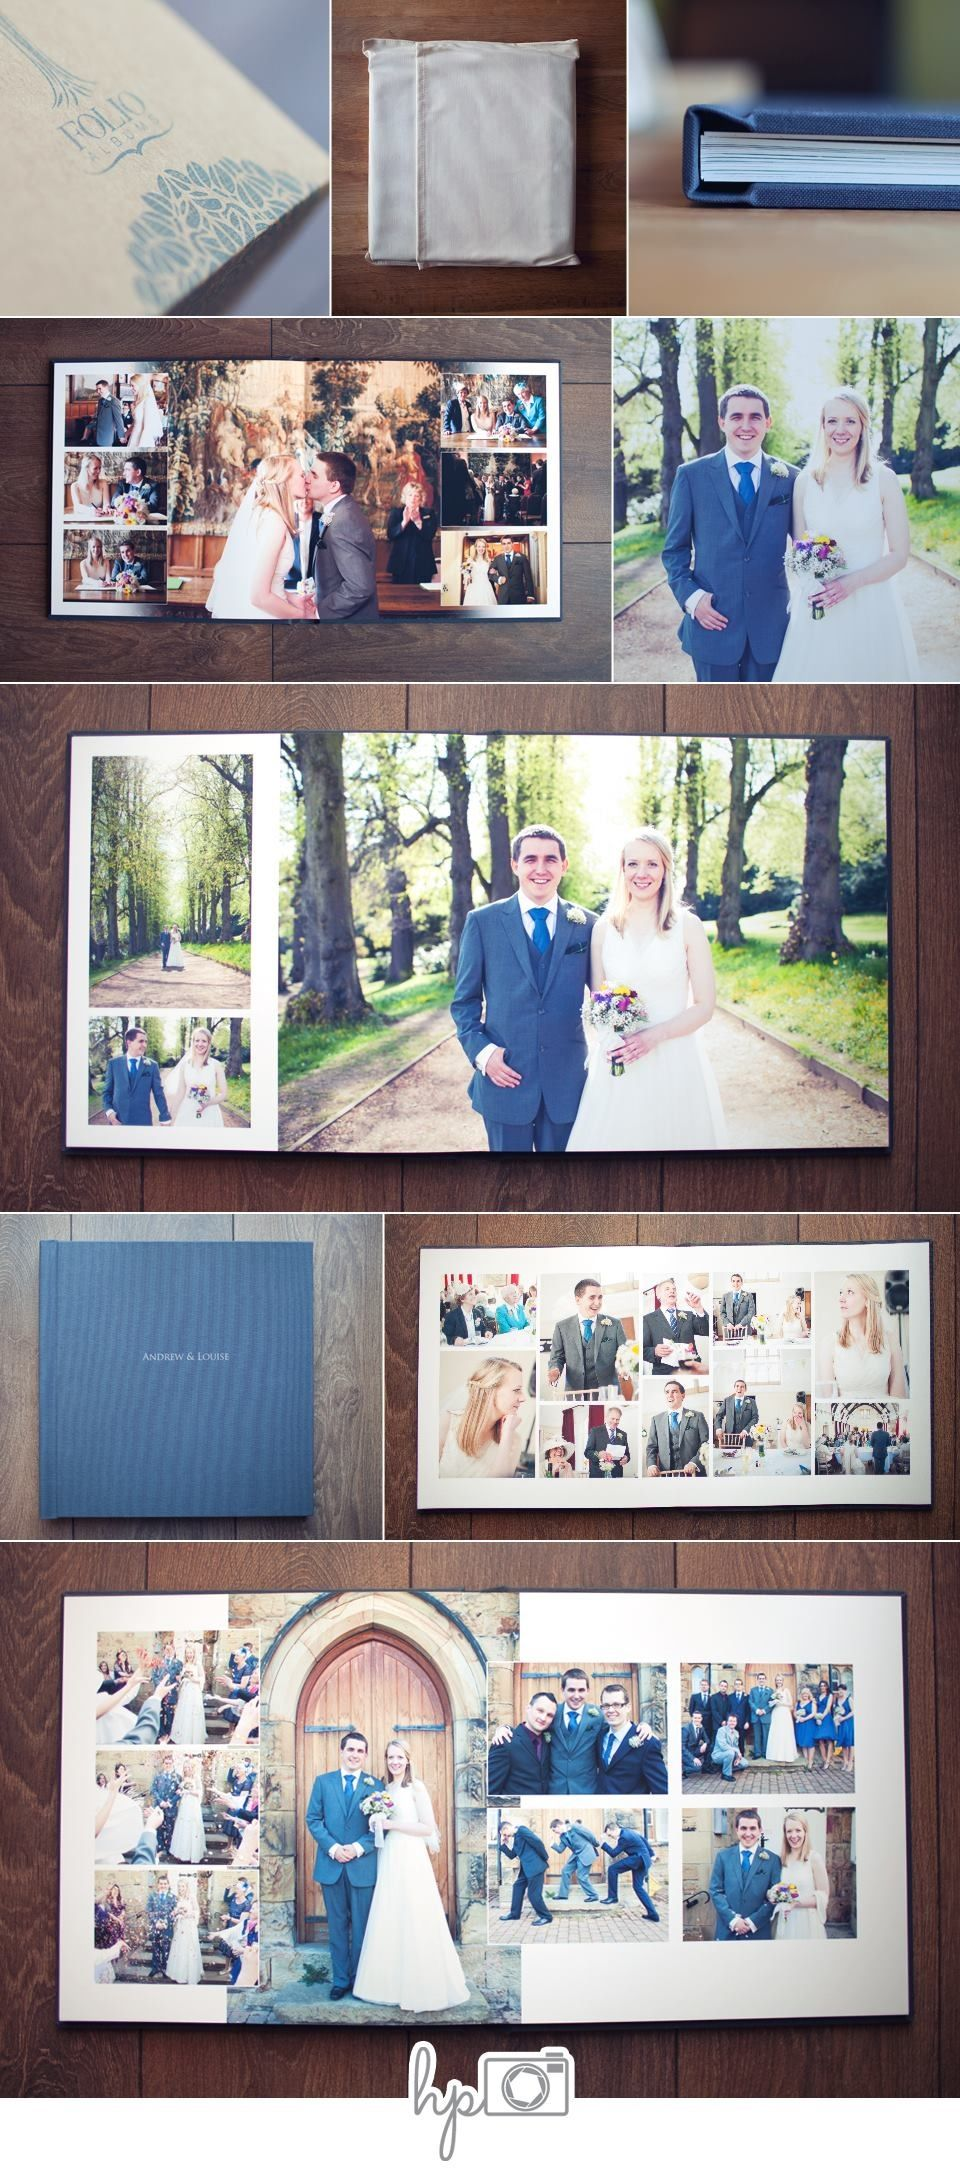 Folio Albums Wedding Album Design And Page Layouts Wedding Photo Album Layout Photo Album Design Wedding Photo Albums